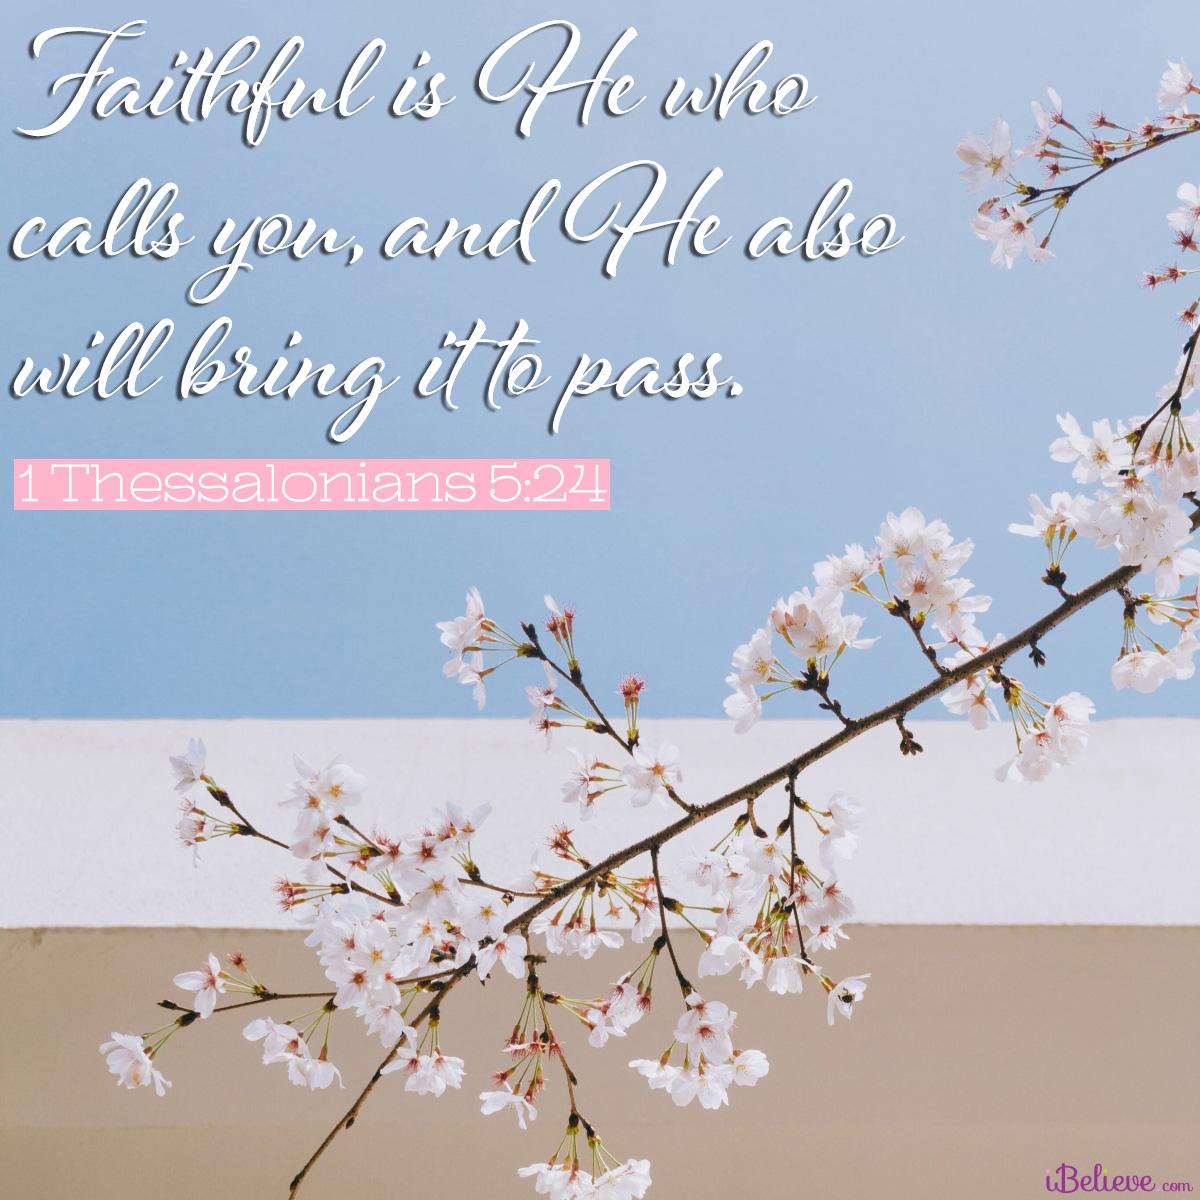 2 Thessalonians 5:24, inspirational image